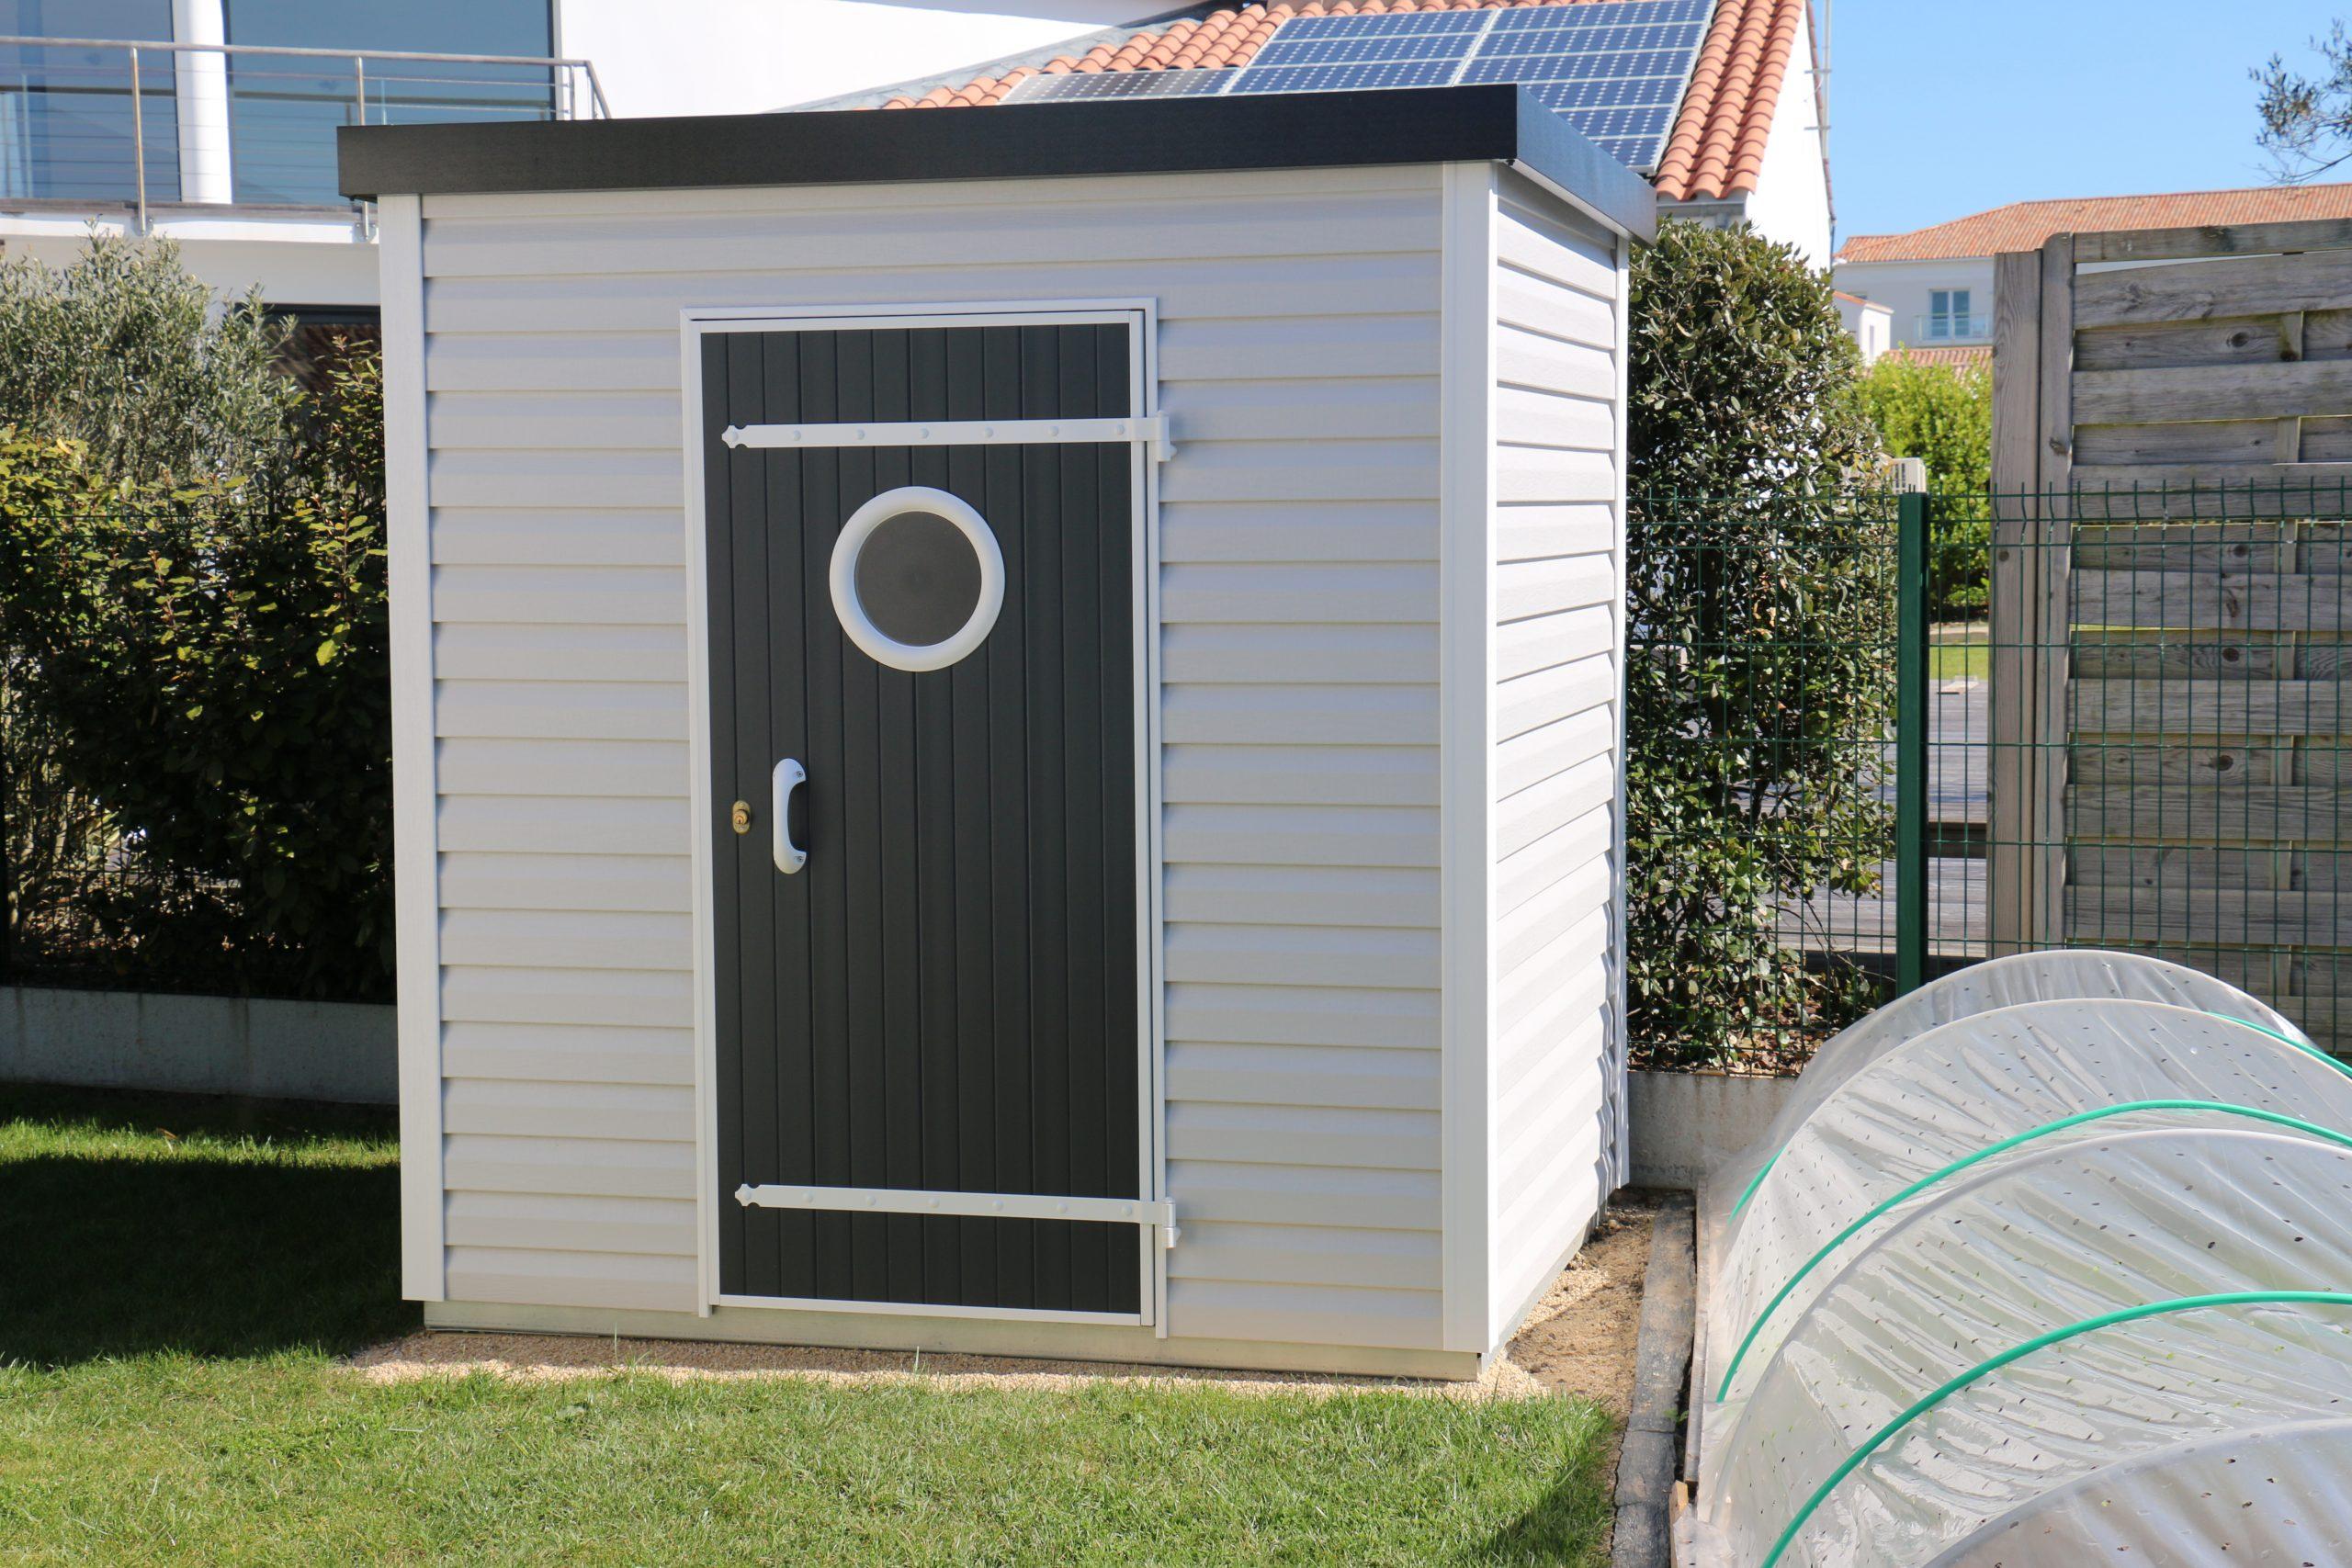 Abri De Jardin Design Toit Plat 3,72 M² - Abri Pvc < 10 M² Nea Concept concernant Abri De Jardin Pvc Toit Plat